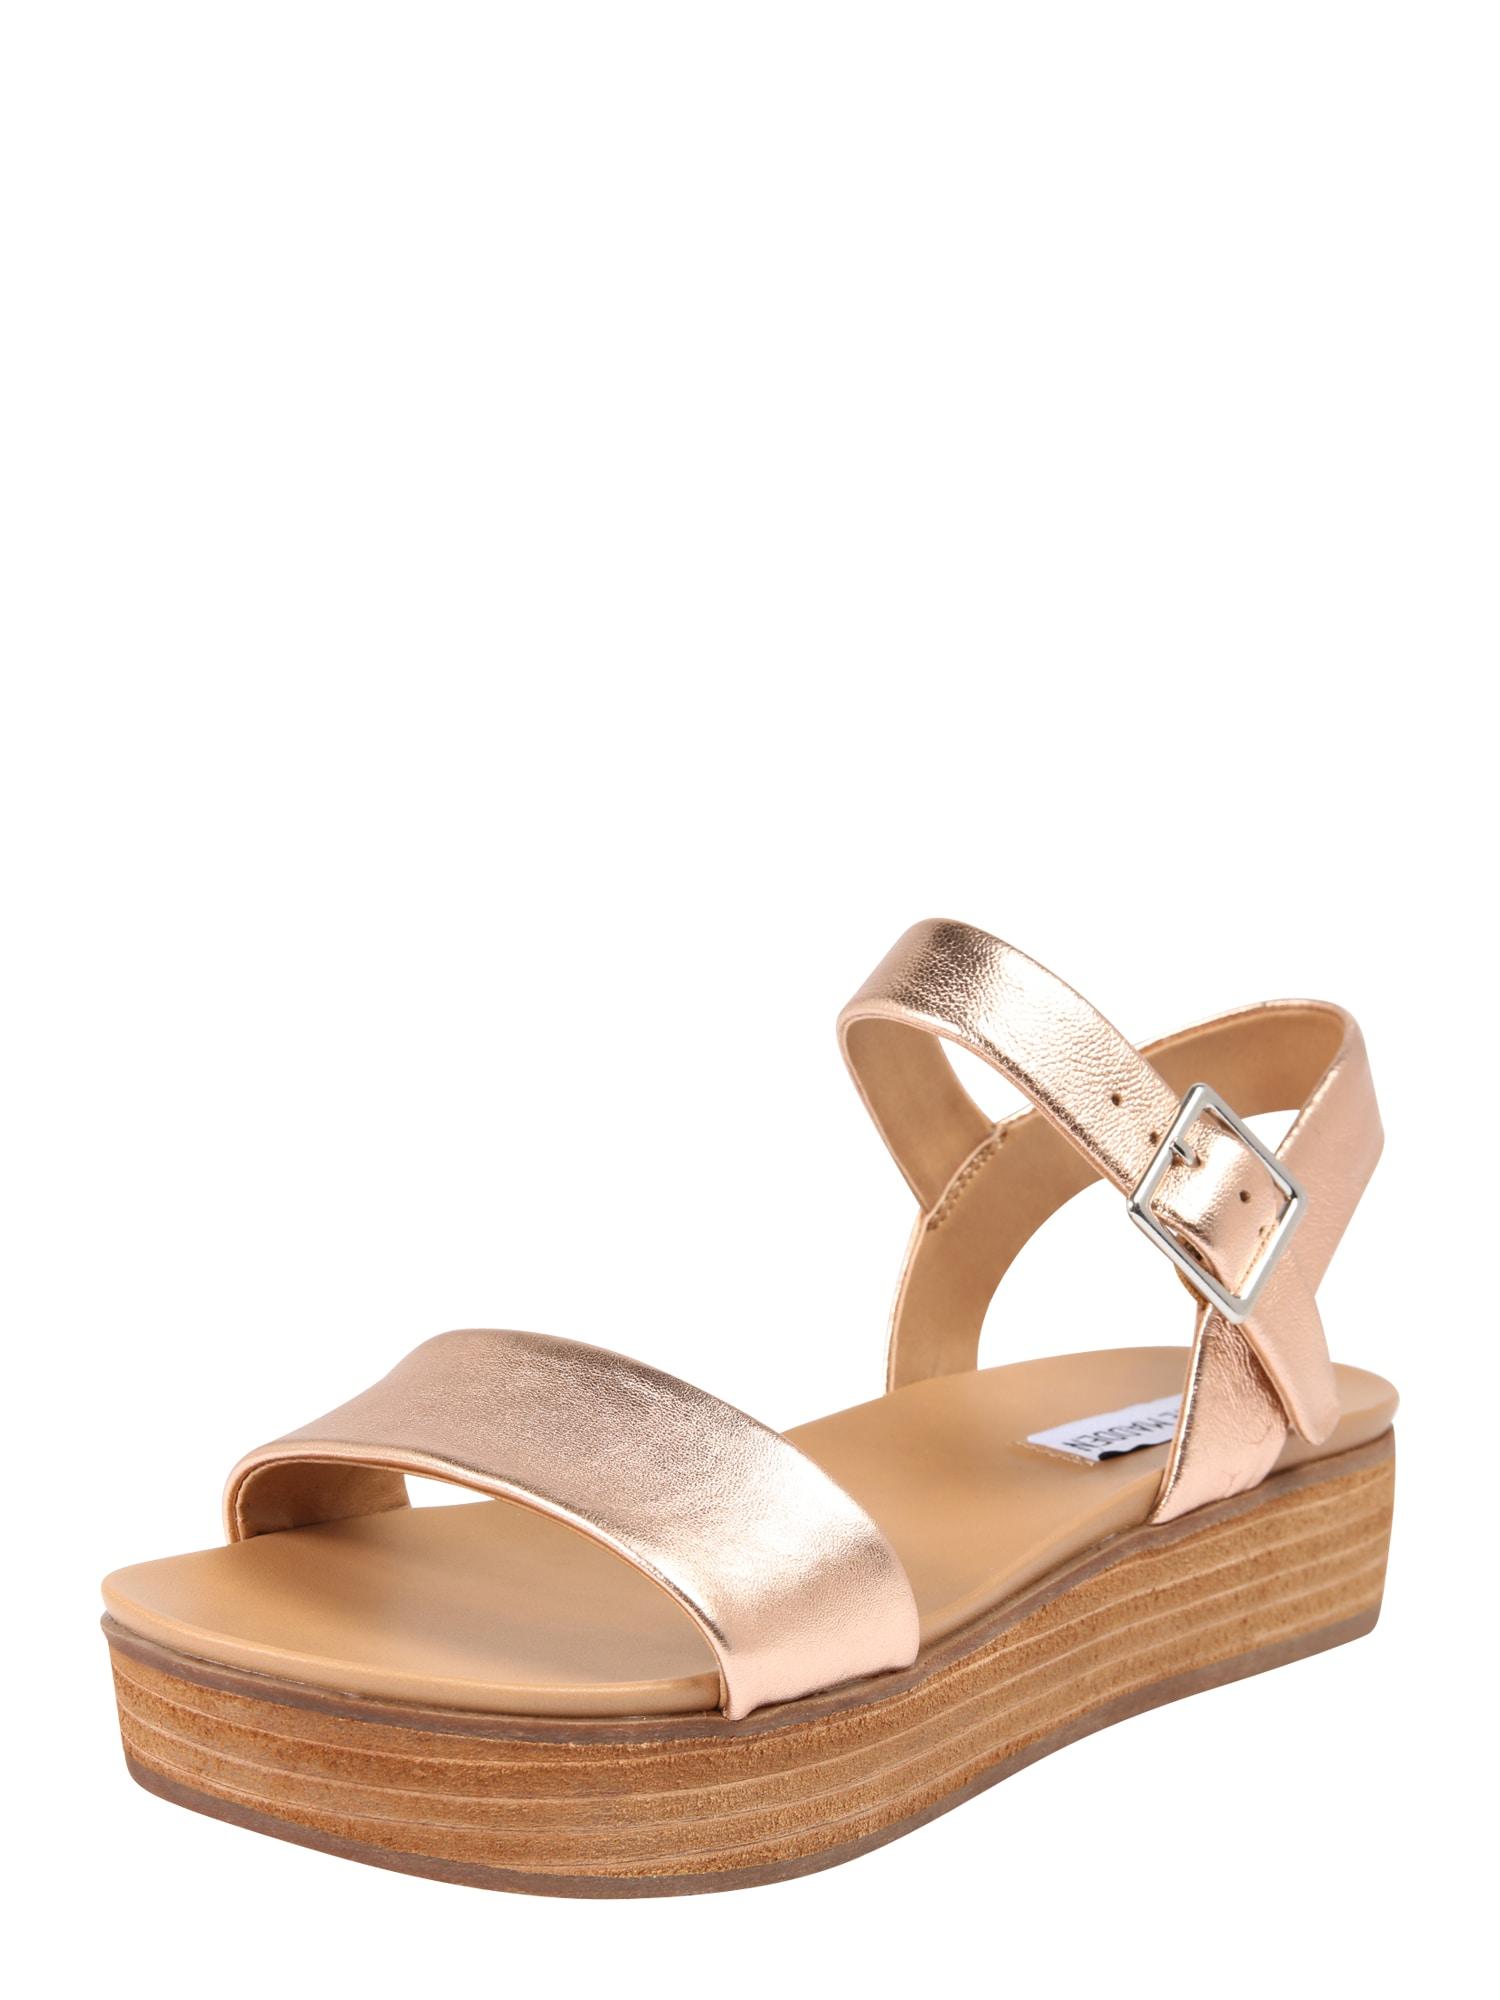 Páskové sandály AIDA zlatá růžová STEVE MADDEN